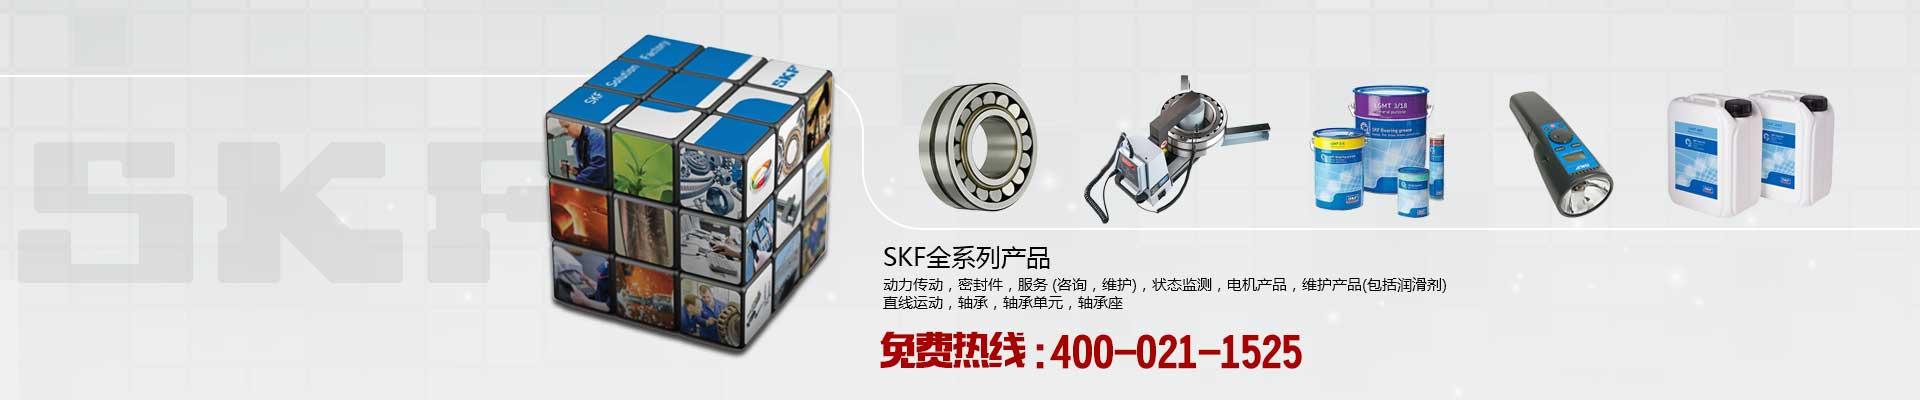 SKF中国有限公司|SKF进口轴承|SKF进口轴承专卖店_驿涌动力机械(上海)有限公司